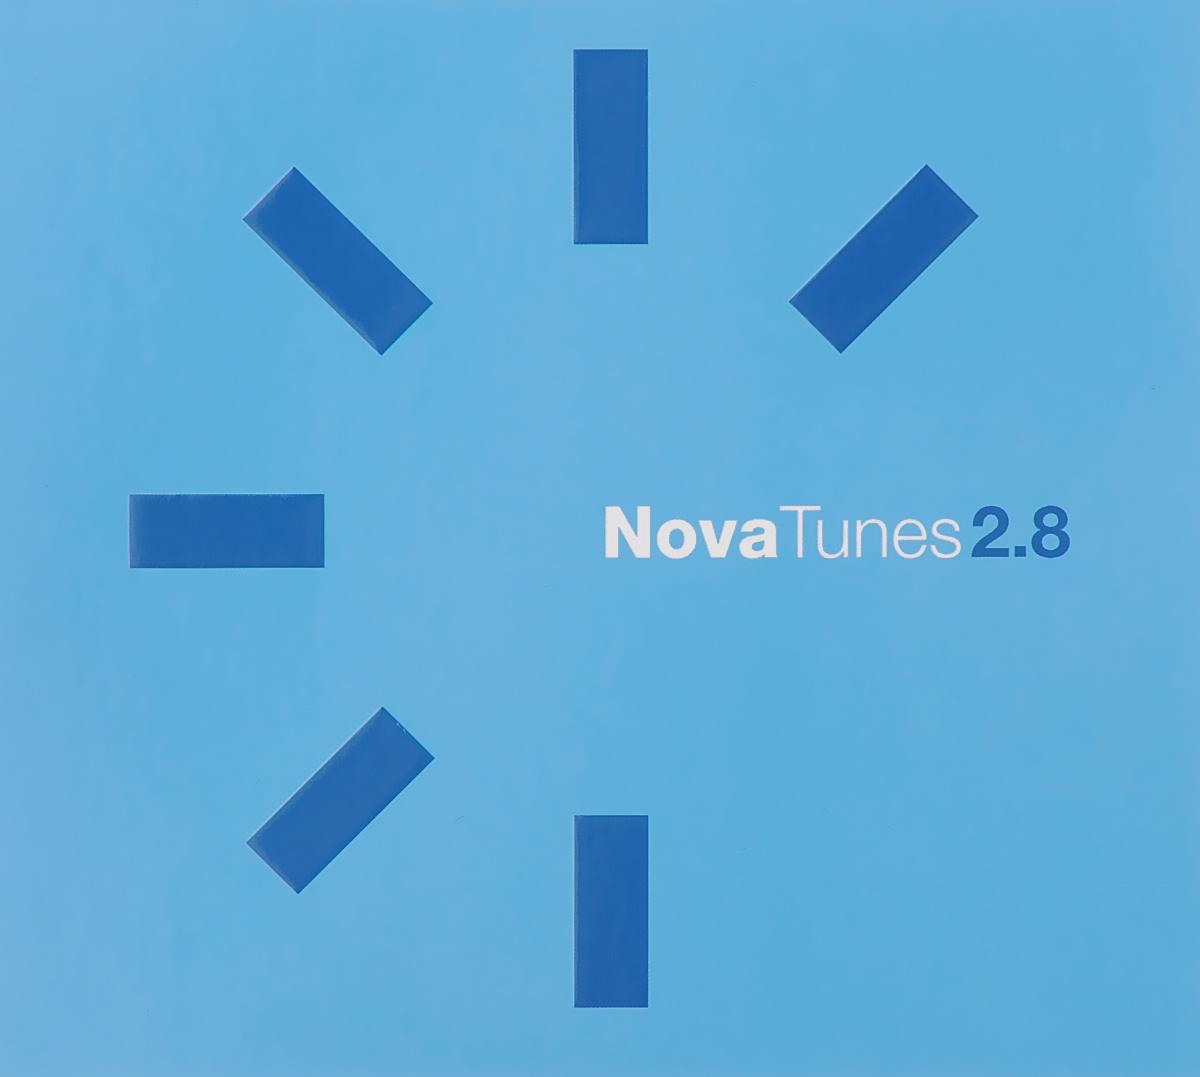 Nova Tunes 2.8 2013 Audio CD